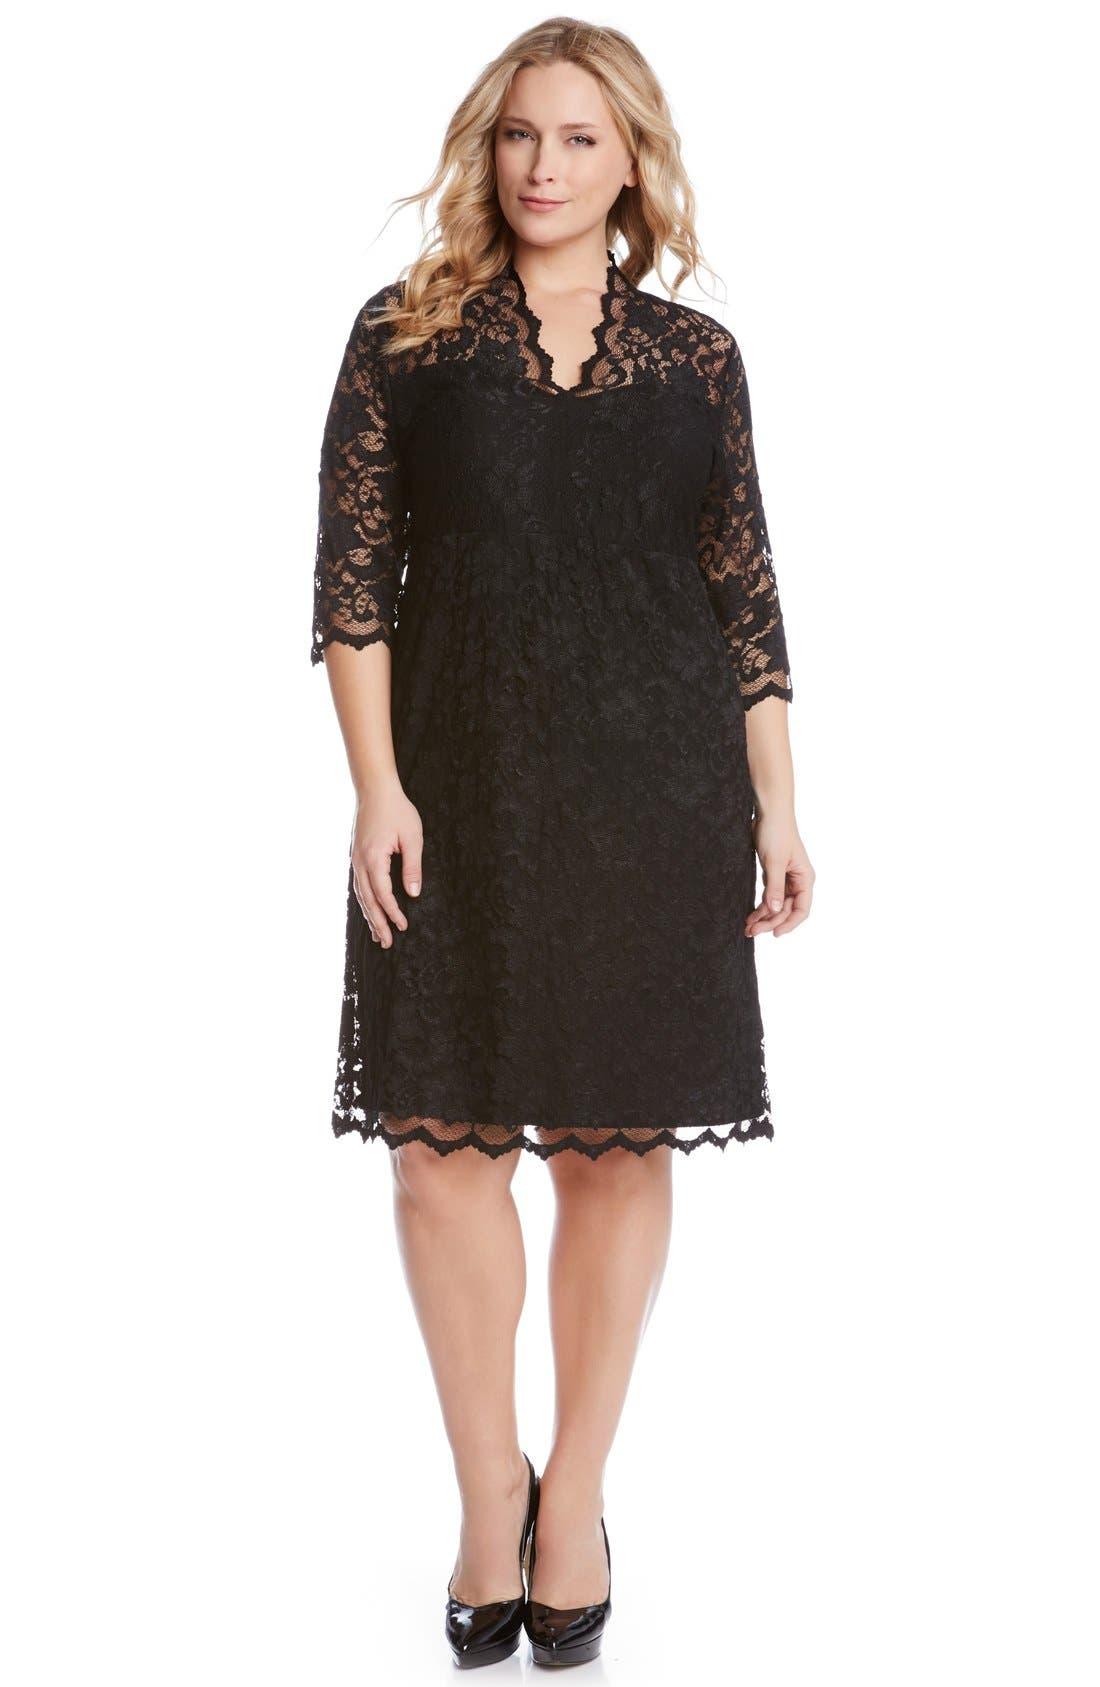 KAREN KANE, Scalloped Stretch Lace Dress, Alternate thumbnail 4, color, BLACK